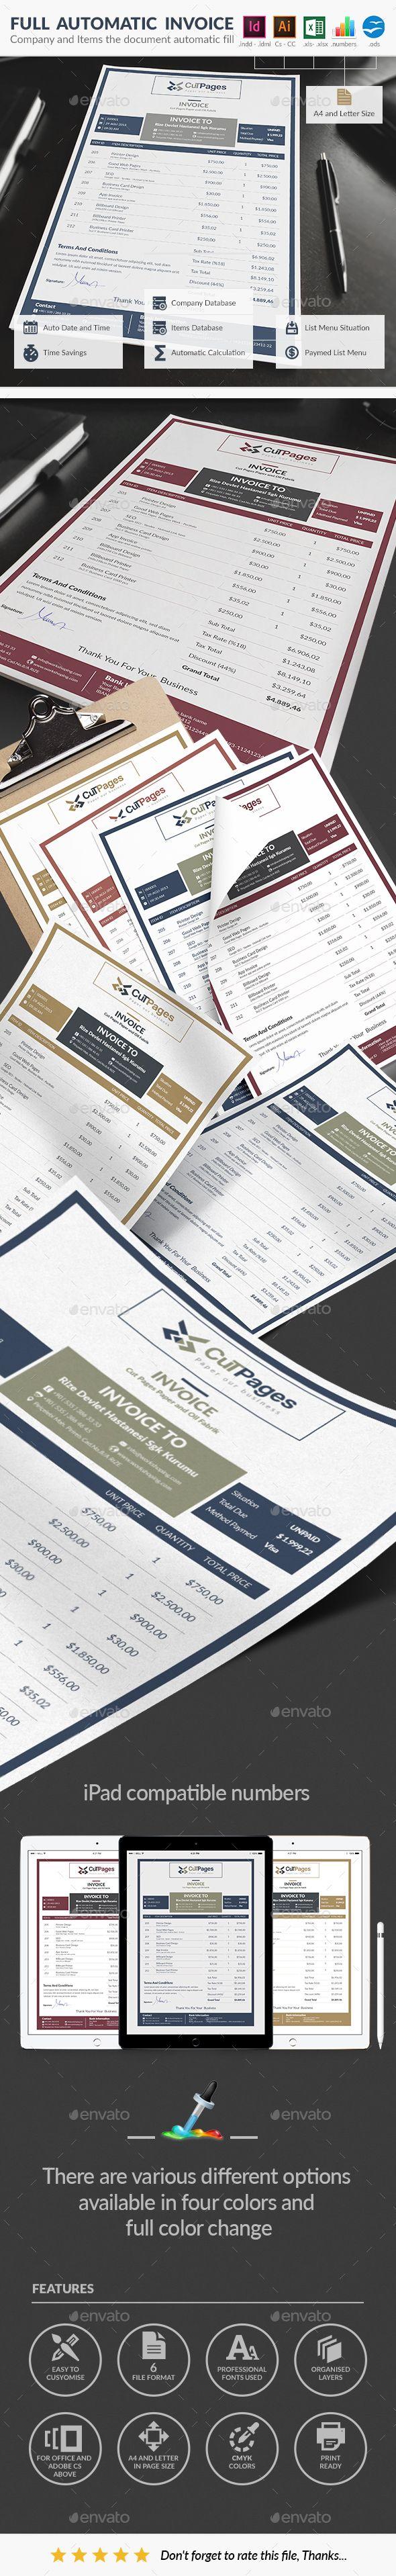 best 25 printable invoice ideas on pinterest